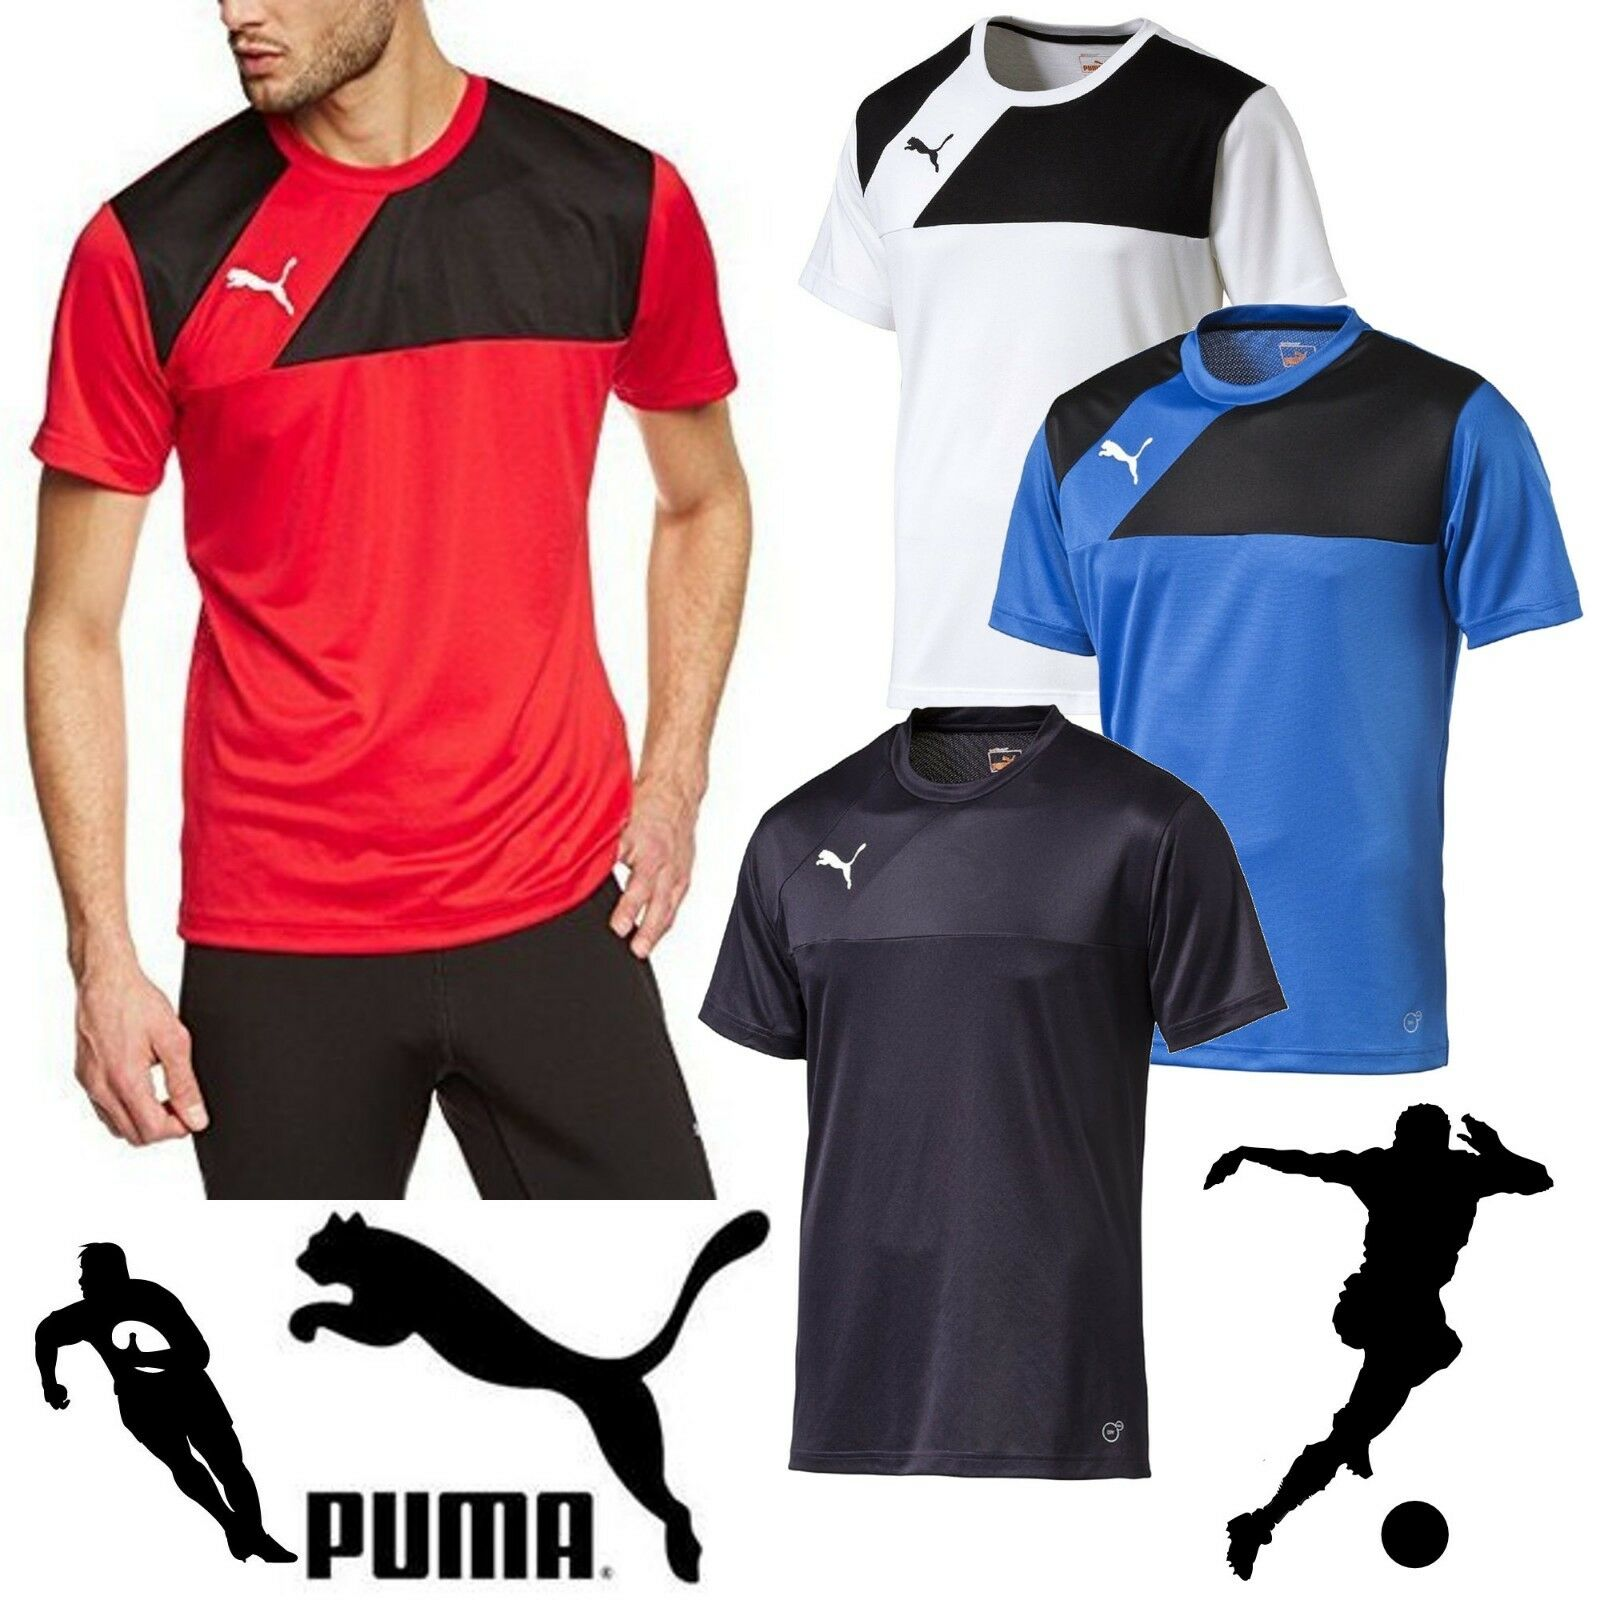 Puma Herren Rosas Fußball Trikots Rugby Tees Sport Gym Team